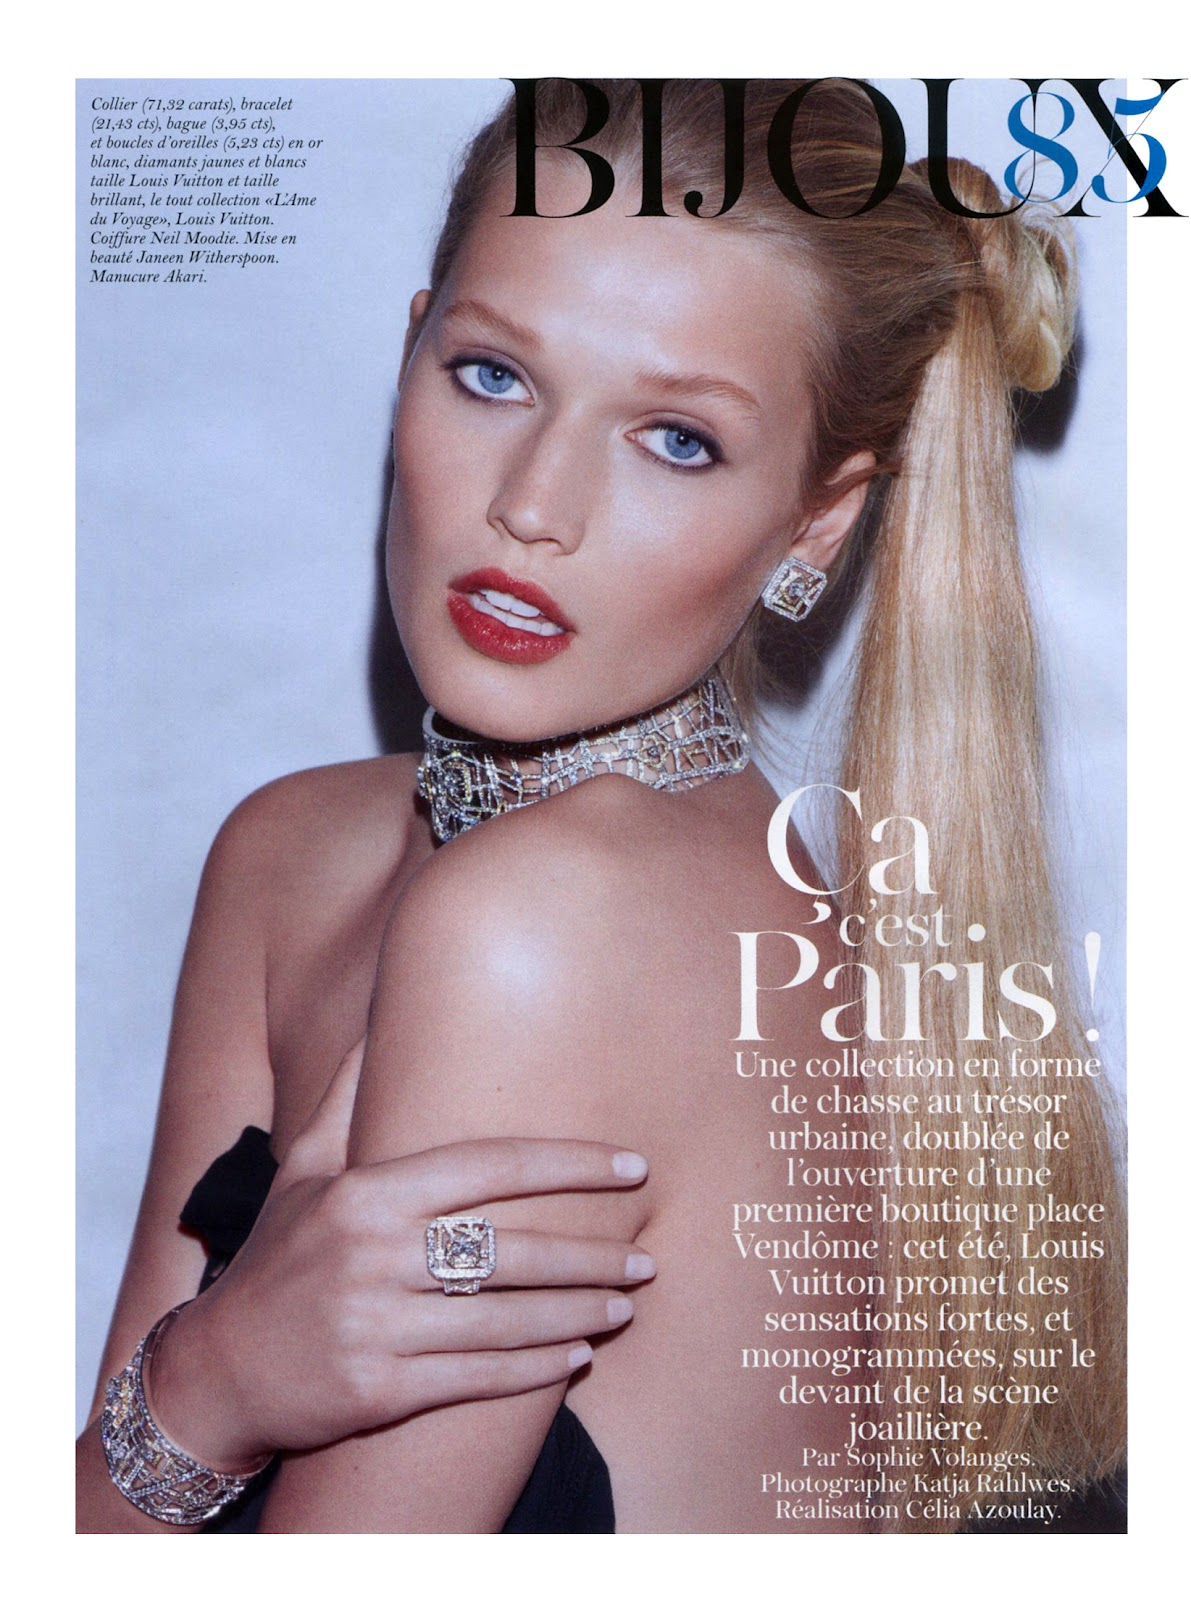 http://3.bp.blogspot.com/-mthEw9oUvDI/UBcYybHVsbI/AAAAAAAAIMw/hkYOikaxpwM/s1600/Toni+Garrn+2012+06-07+Vogue+Paris+Ph+Katja+Rahlwes+003.jpg